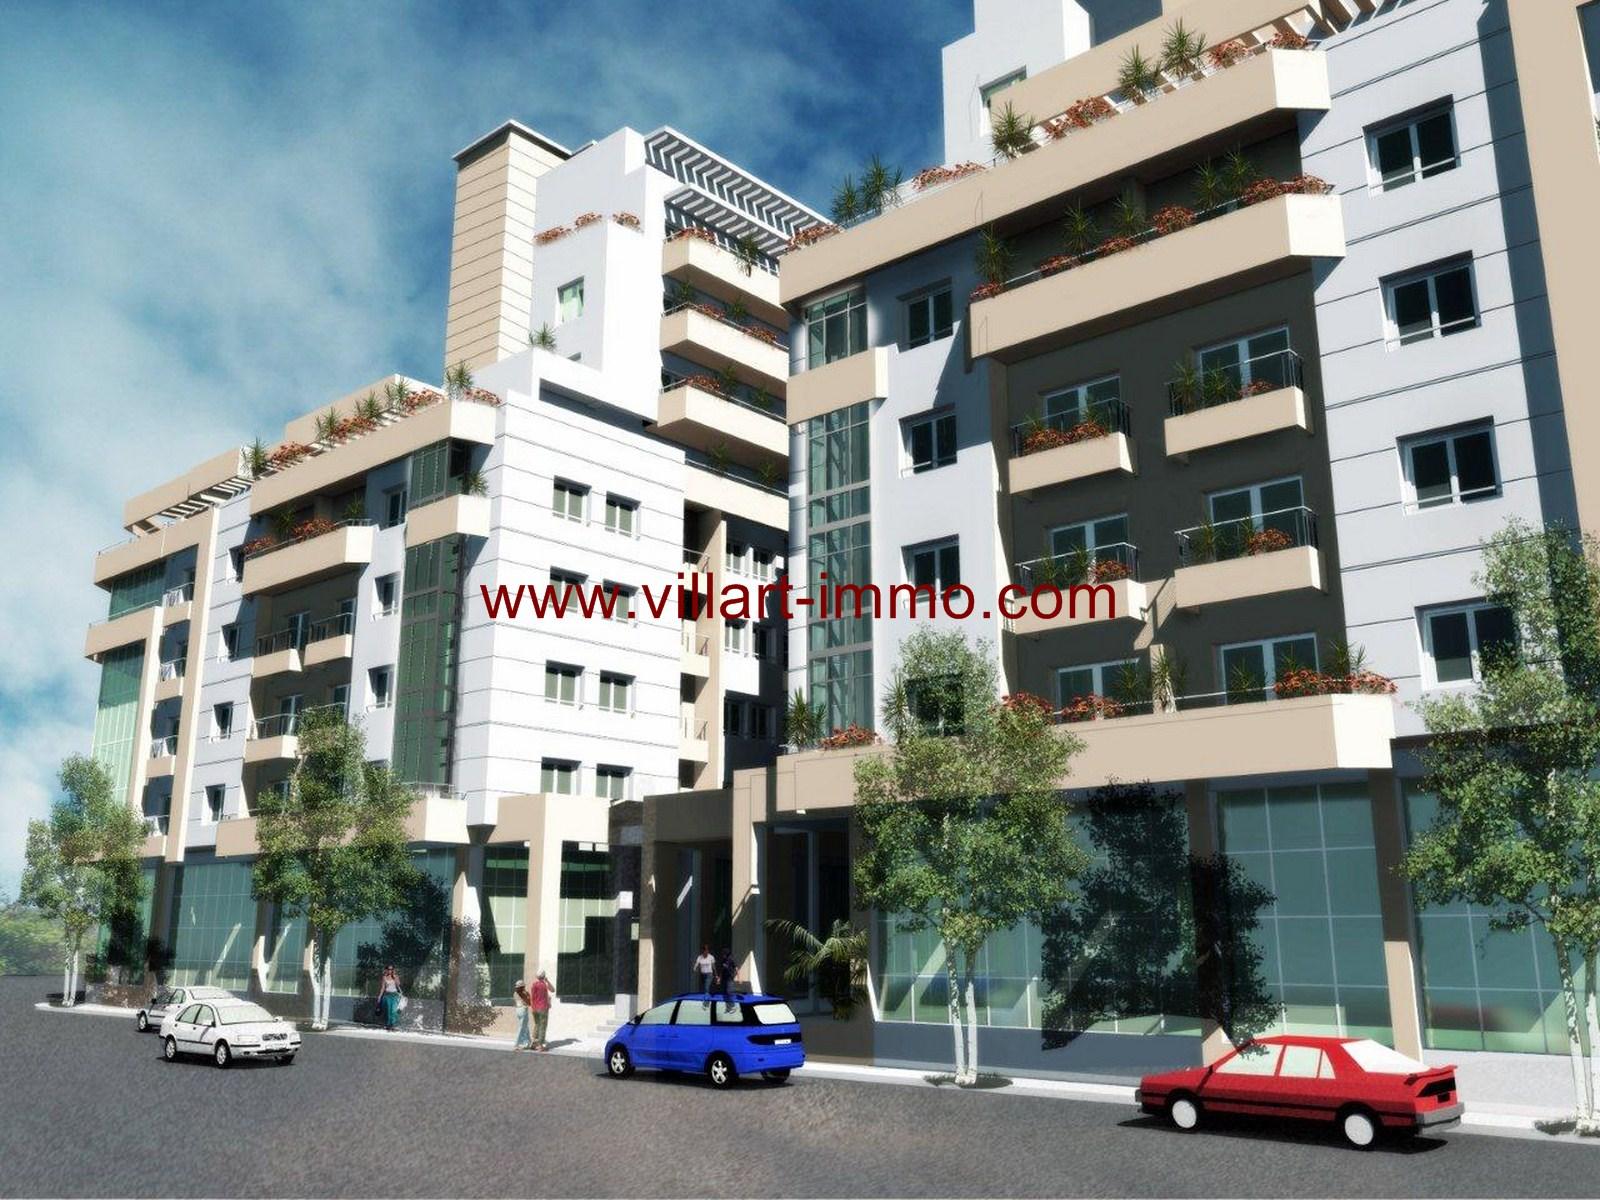 8-Vente-Appartement-Tanger-Centre-ville-SHAZ-Villart Immo